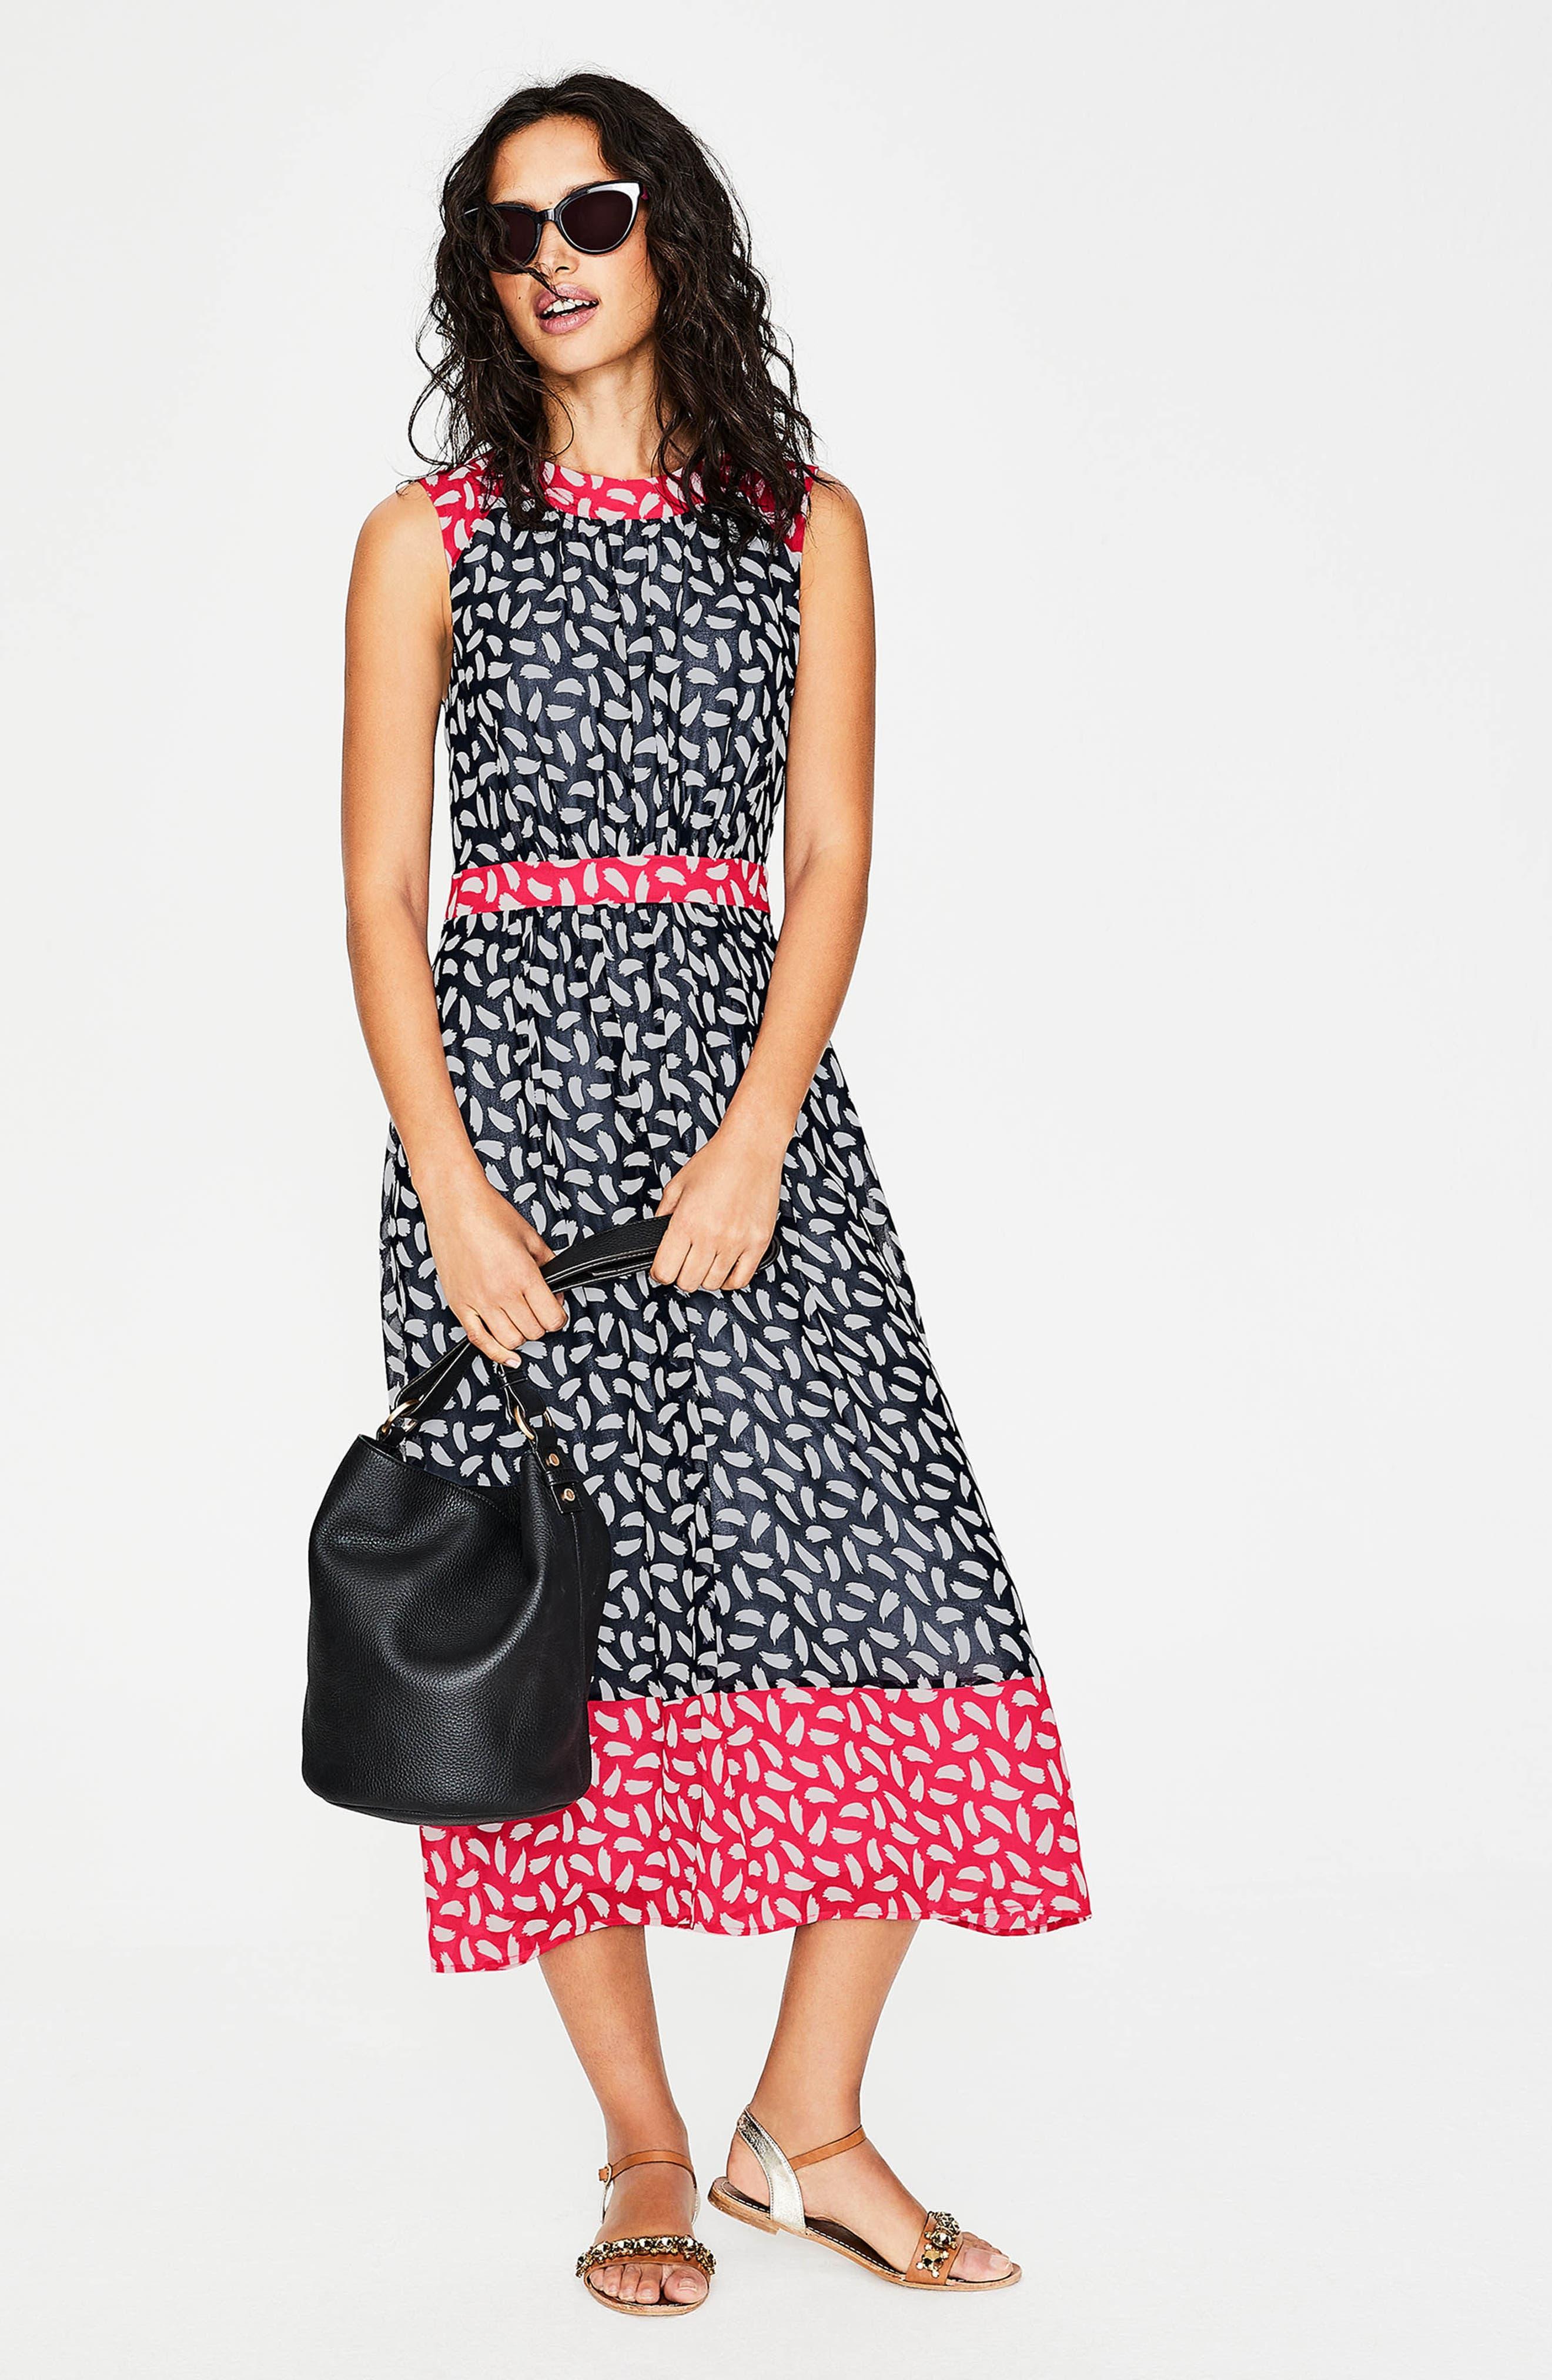 BODEN,                             Sylvie Print Sleeveless Dress,                             Alternate thumbnail 6, color,                             414